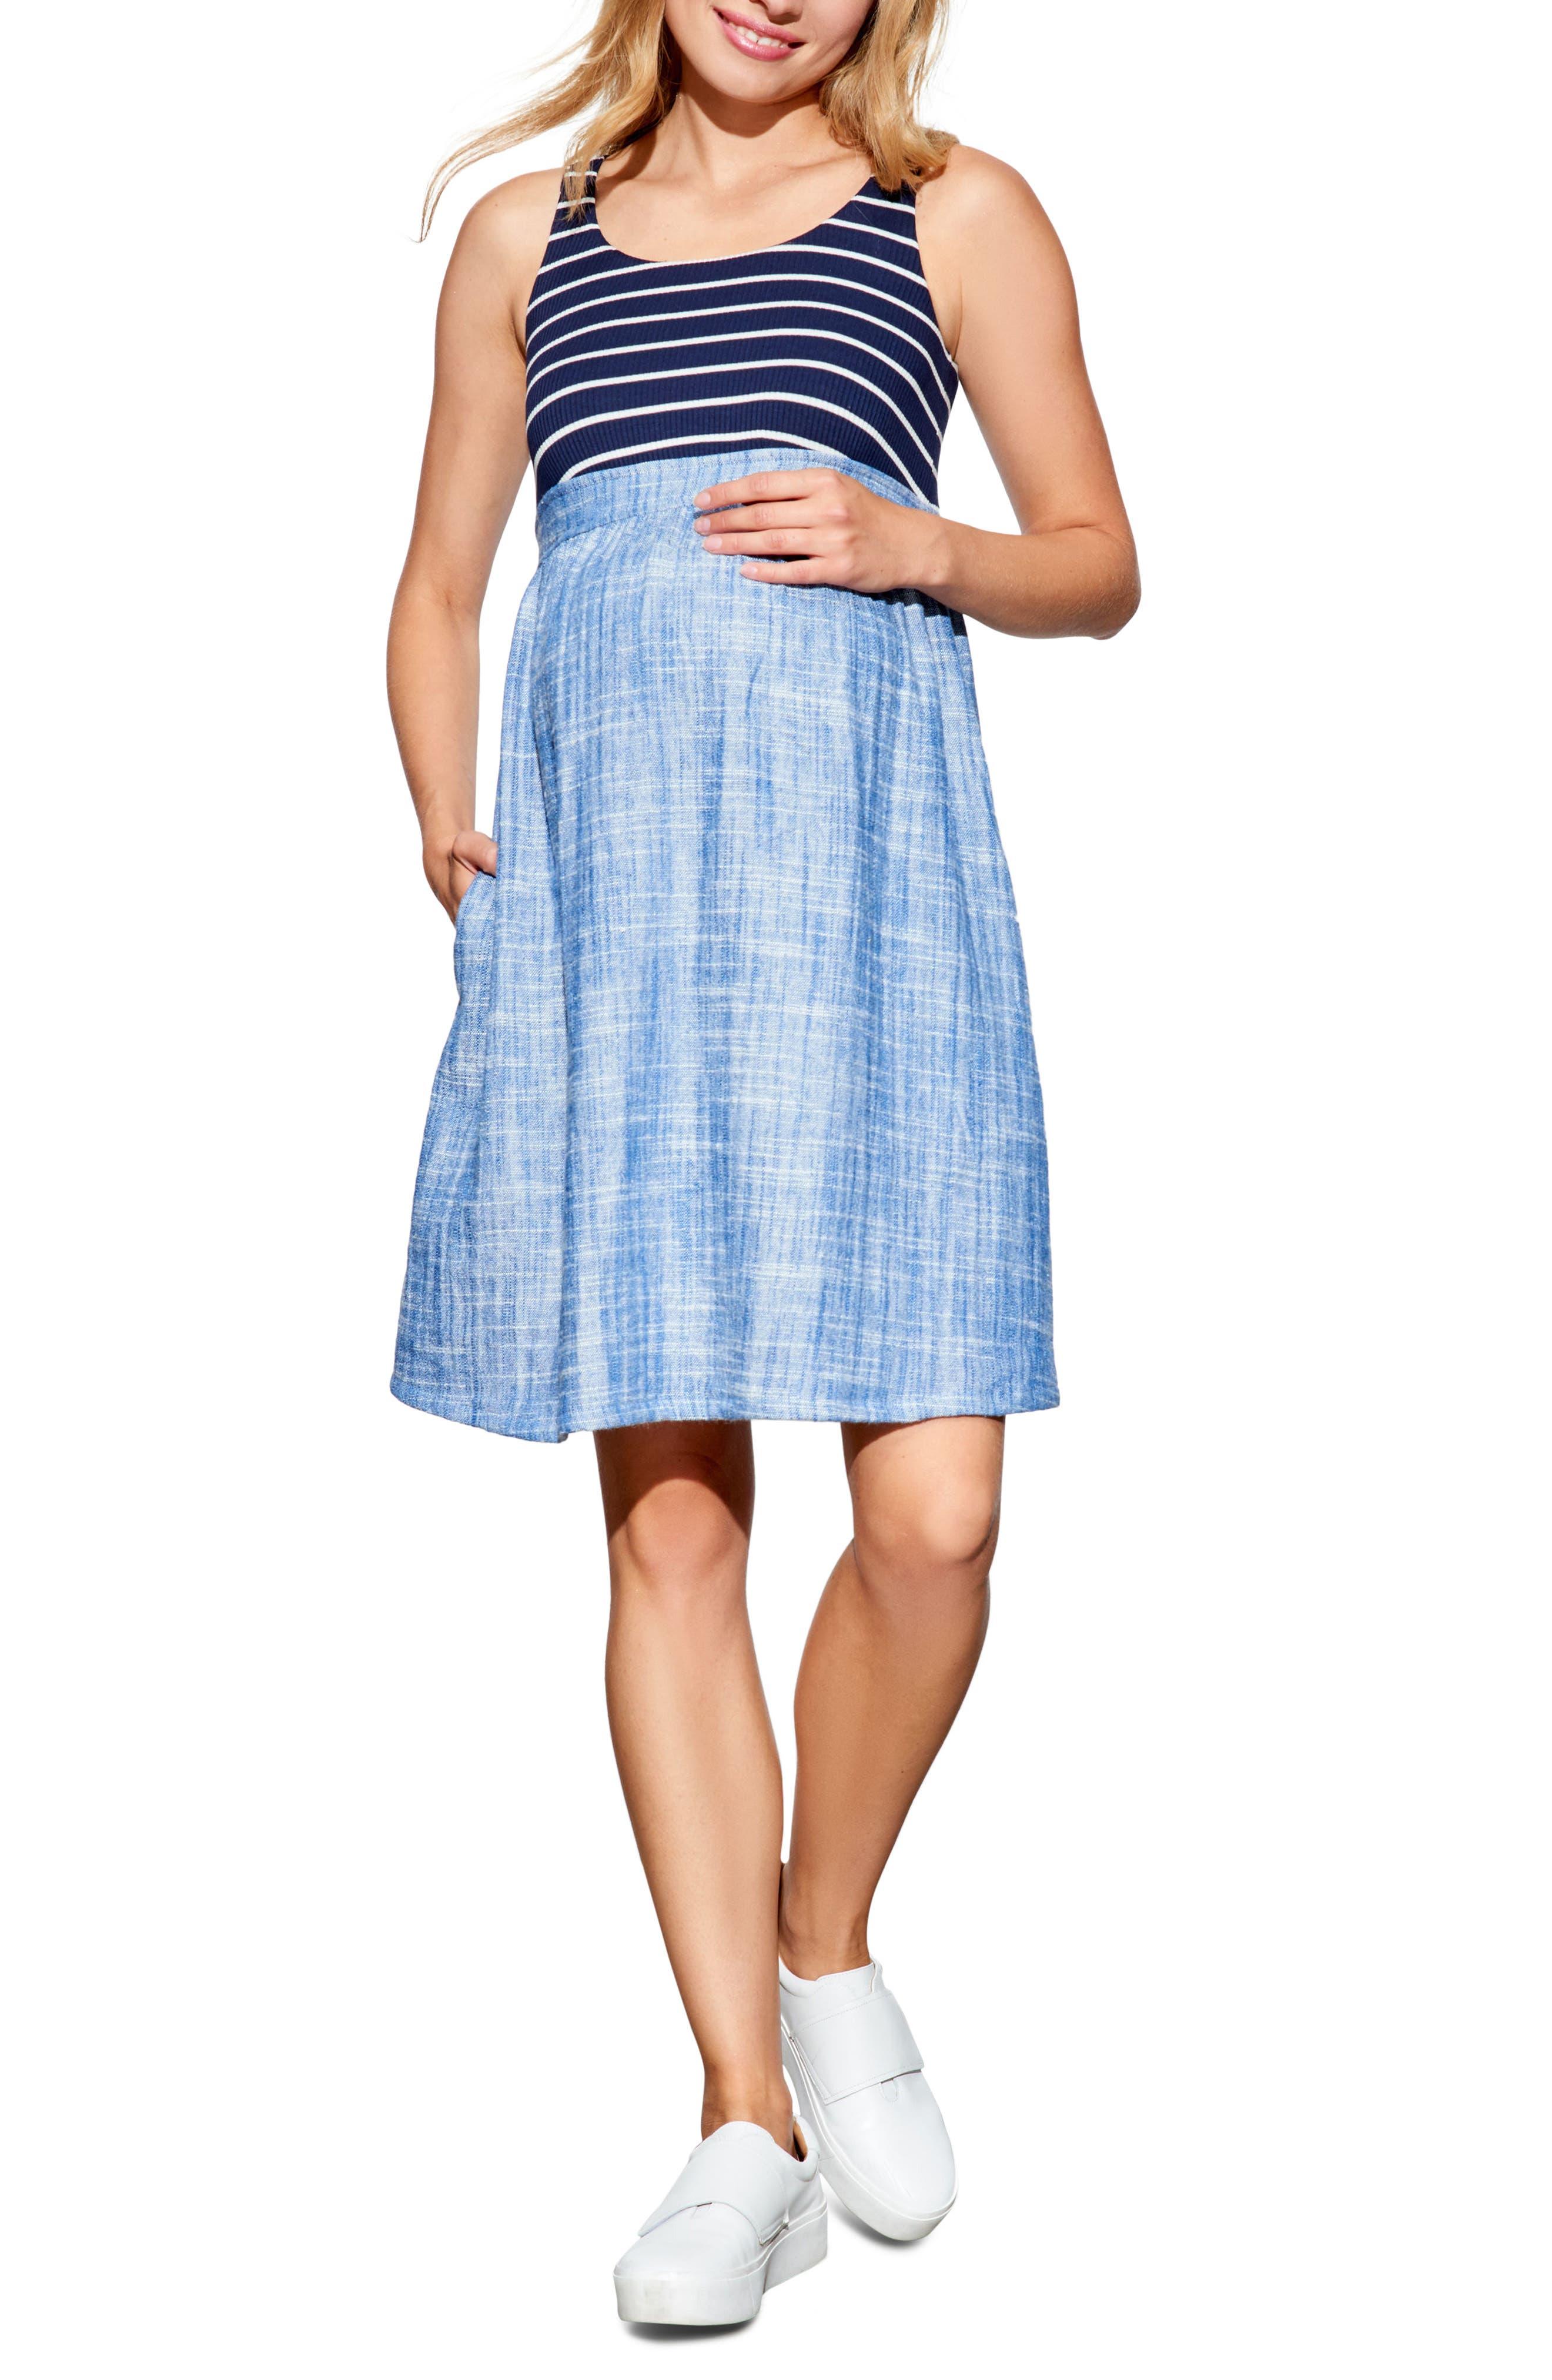 Maternal America Empire Waist Maternity Dress